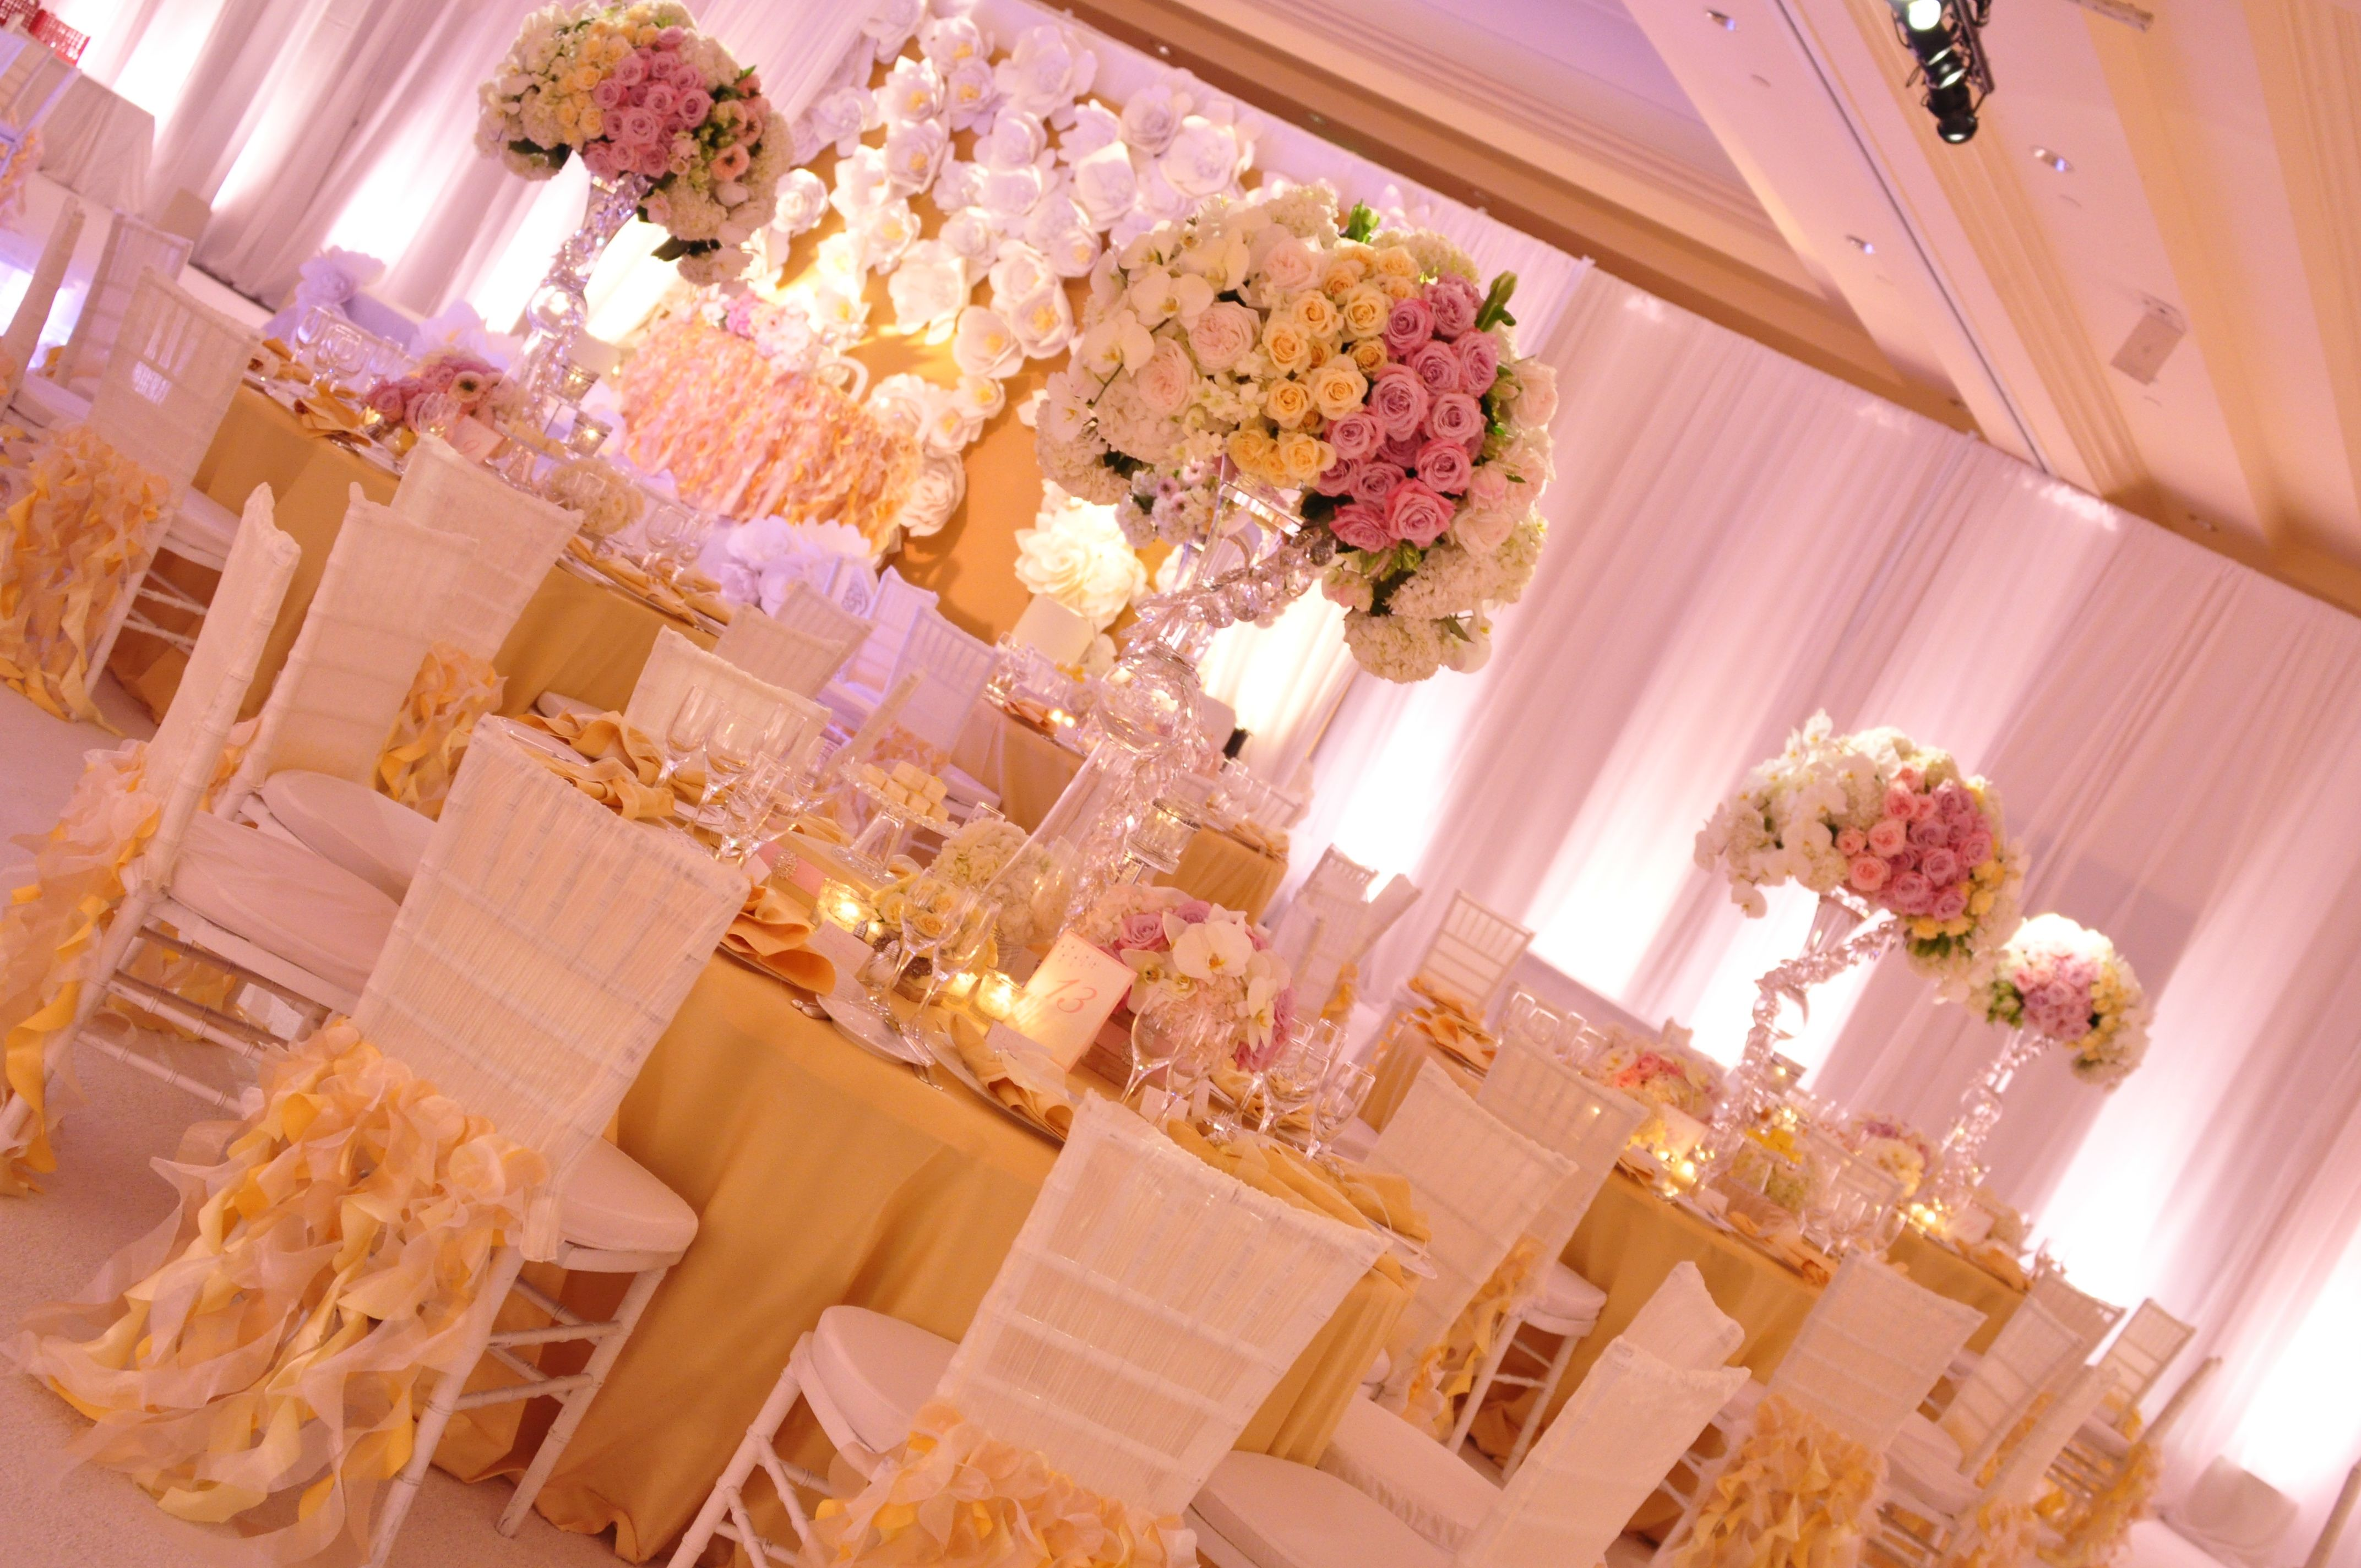 Pin by Anri Khachatorian on Luxurious Weddings   Wedding ...